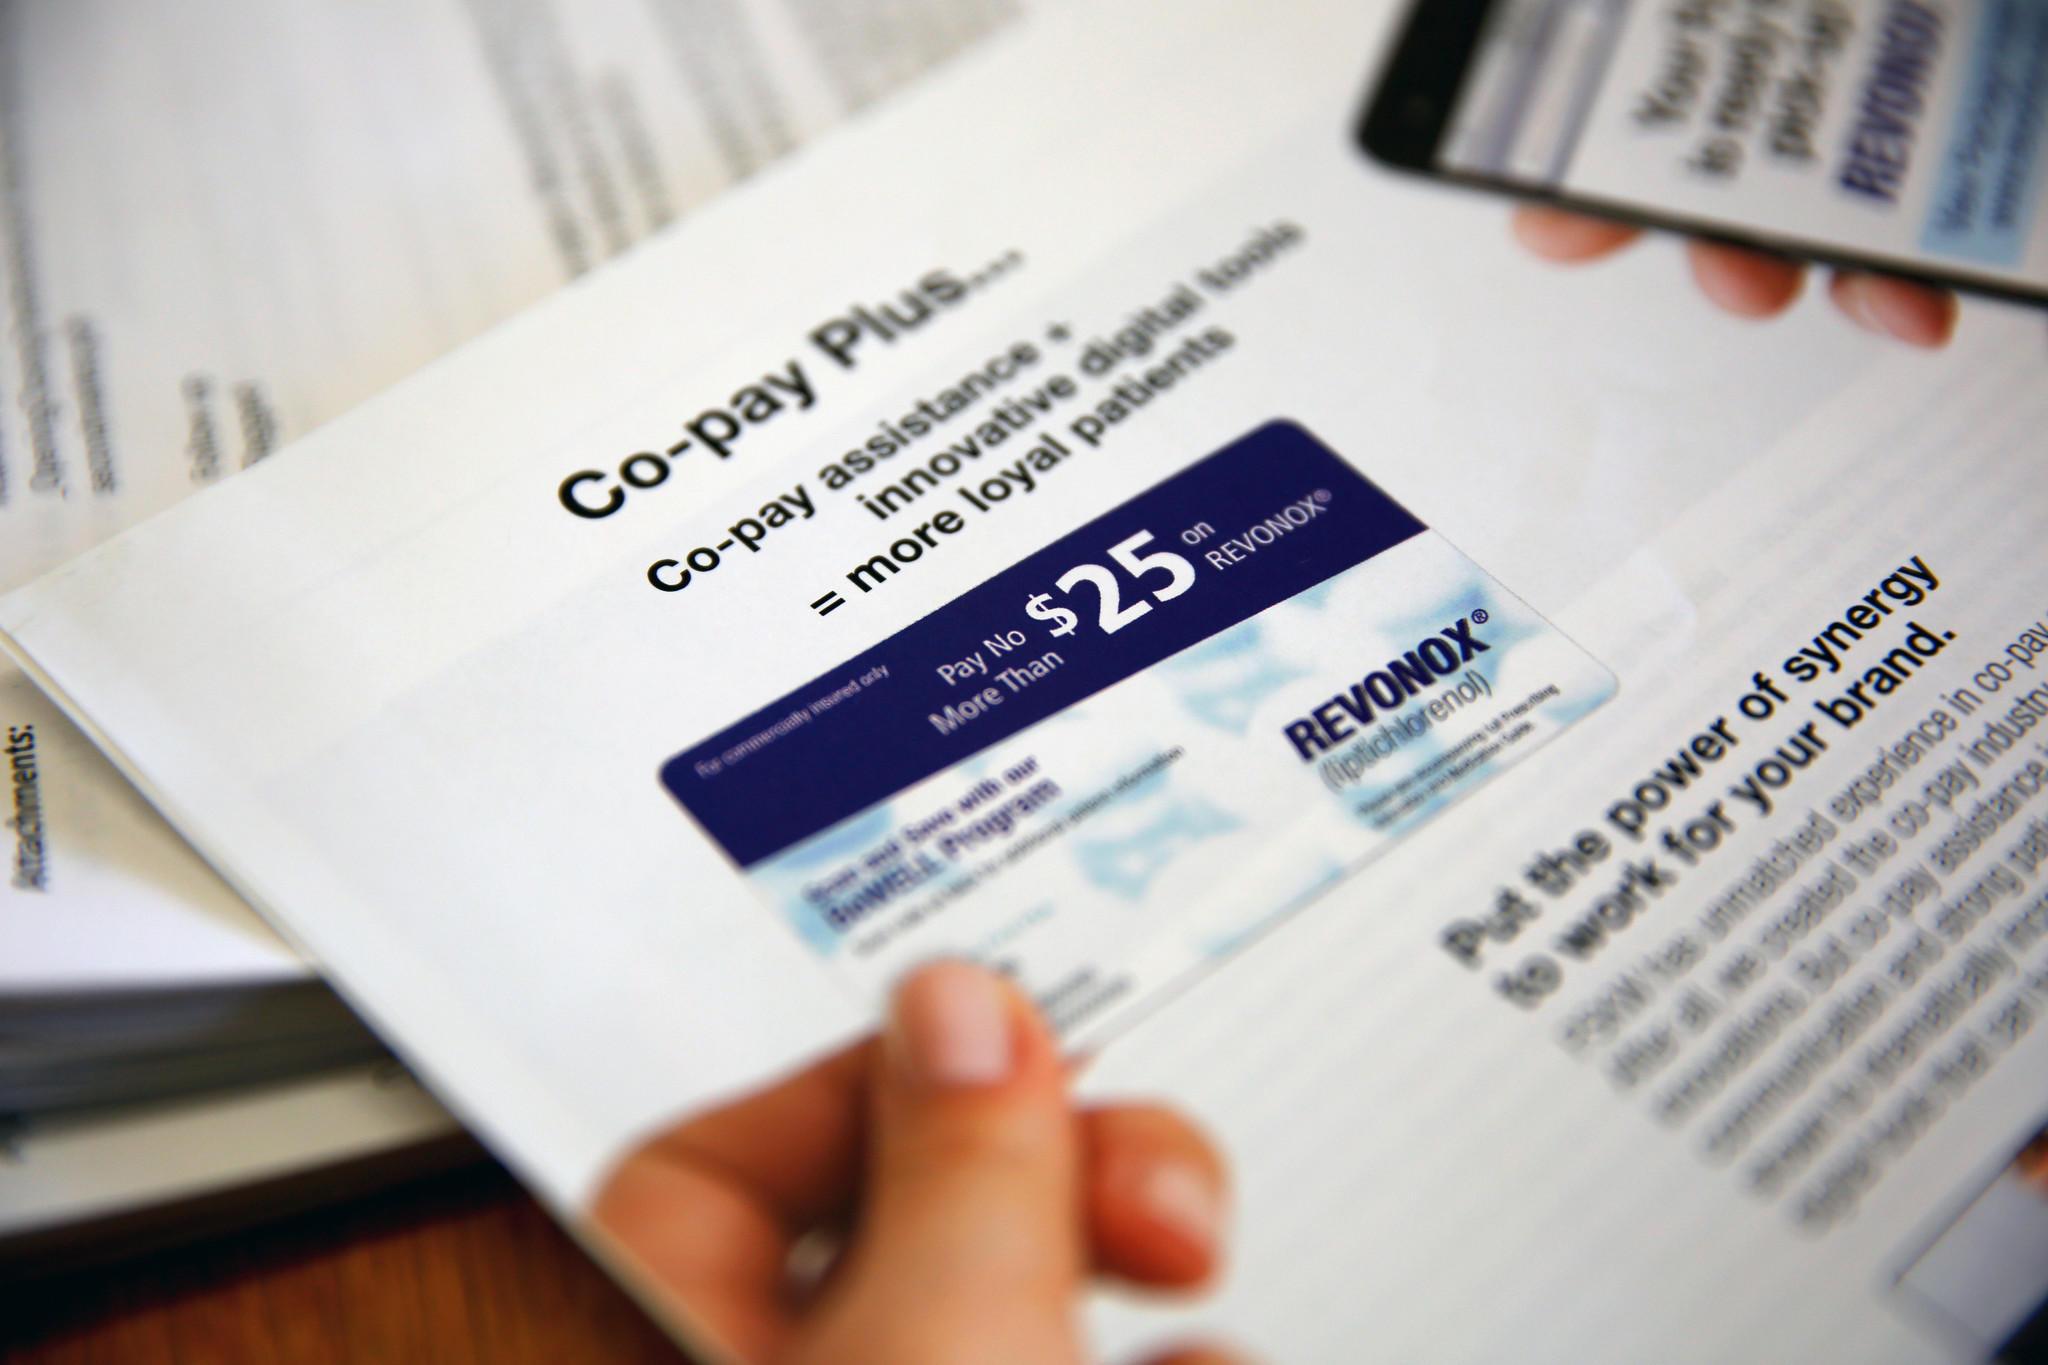 Coronado coupons discounts